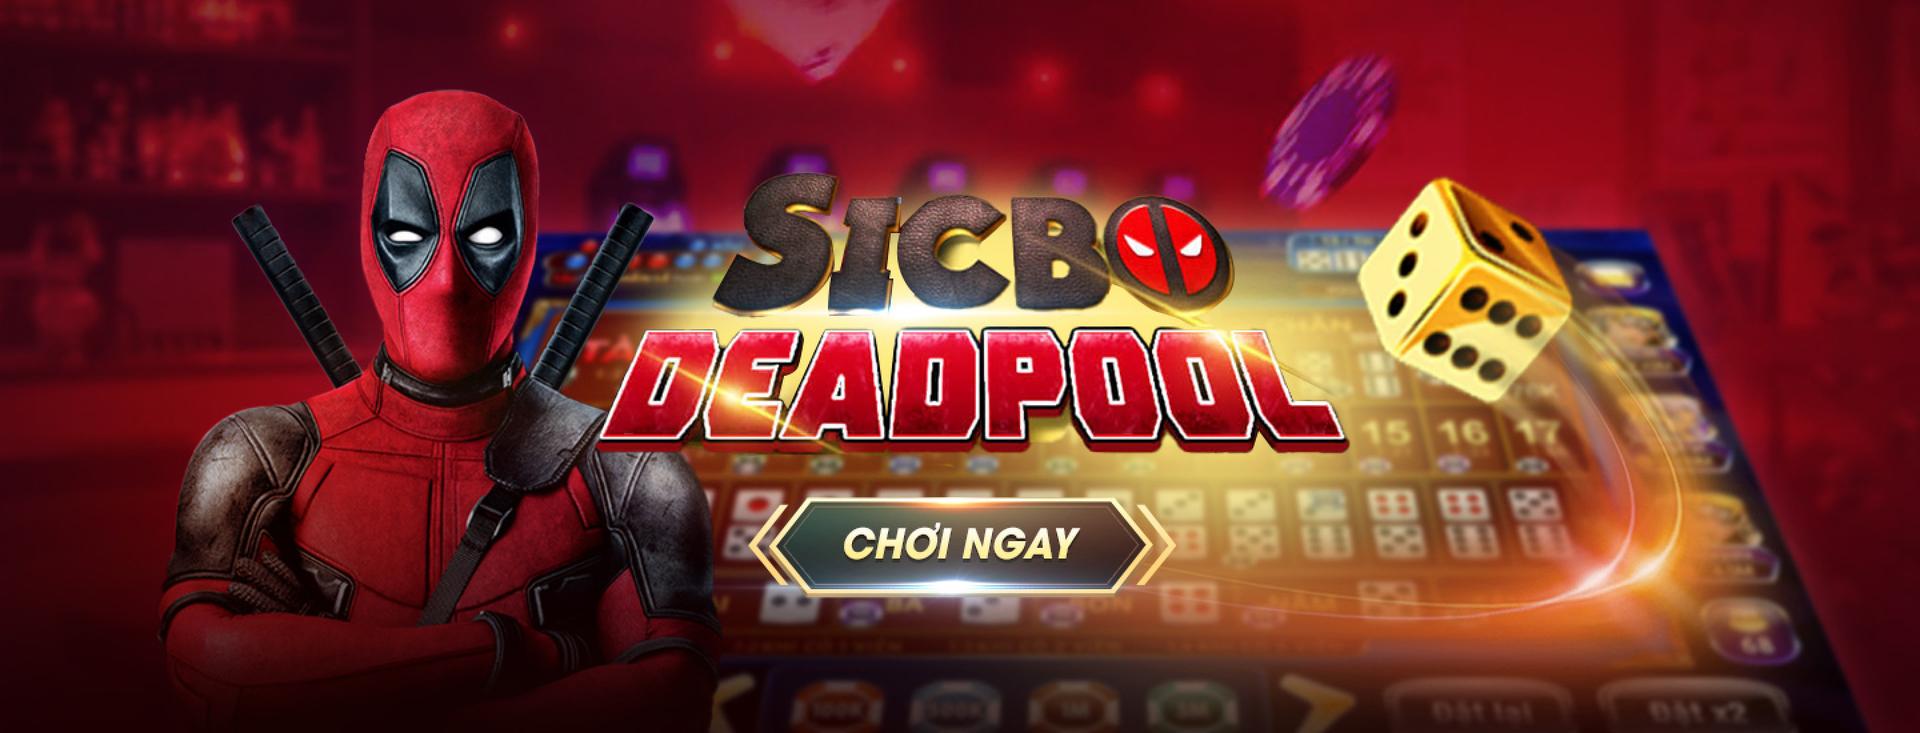 Sicbo Deadpool Banner